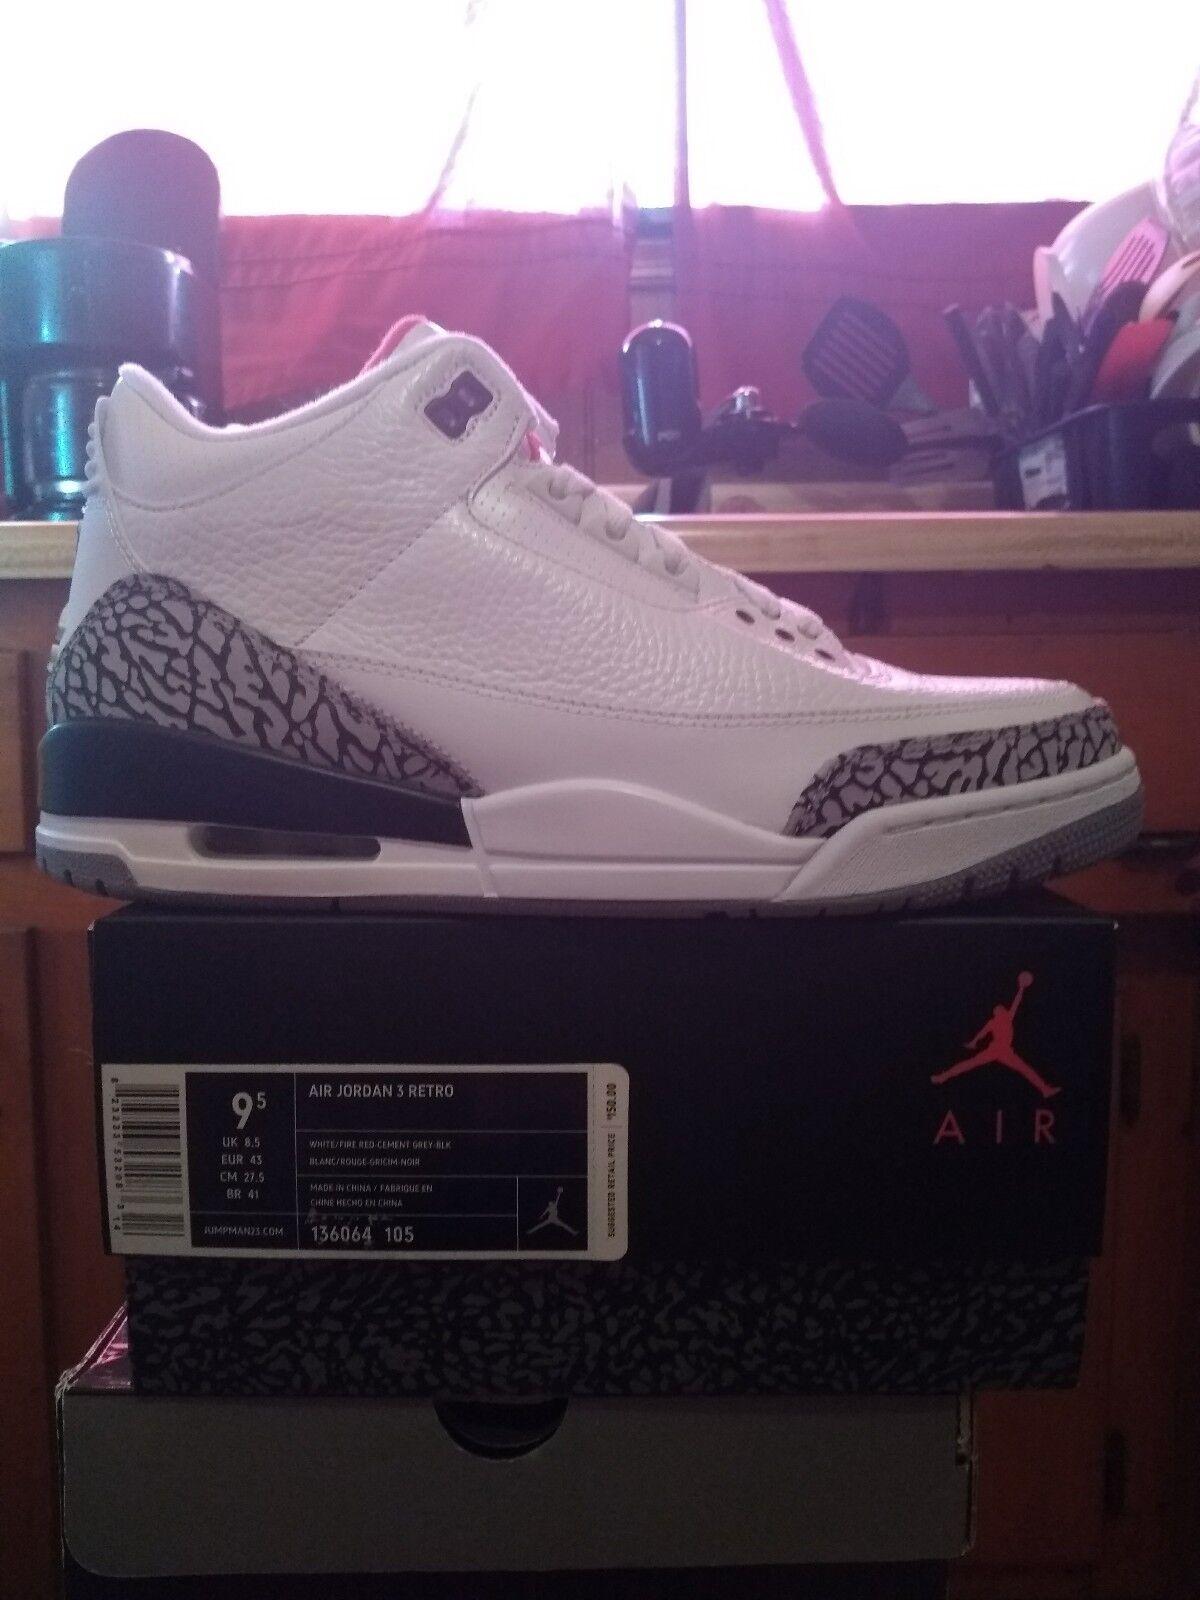 Jordan 3 White Cement 2011 OG Size 9.5 With Receipt